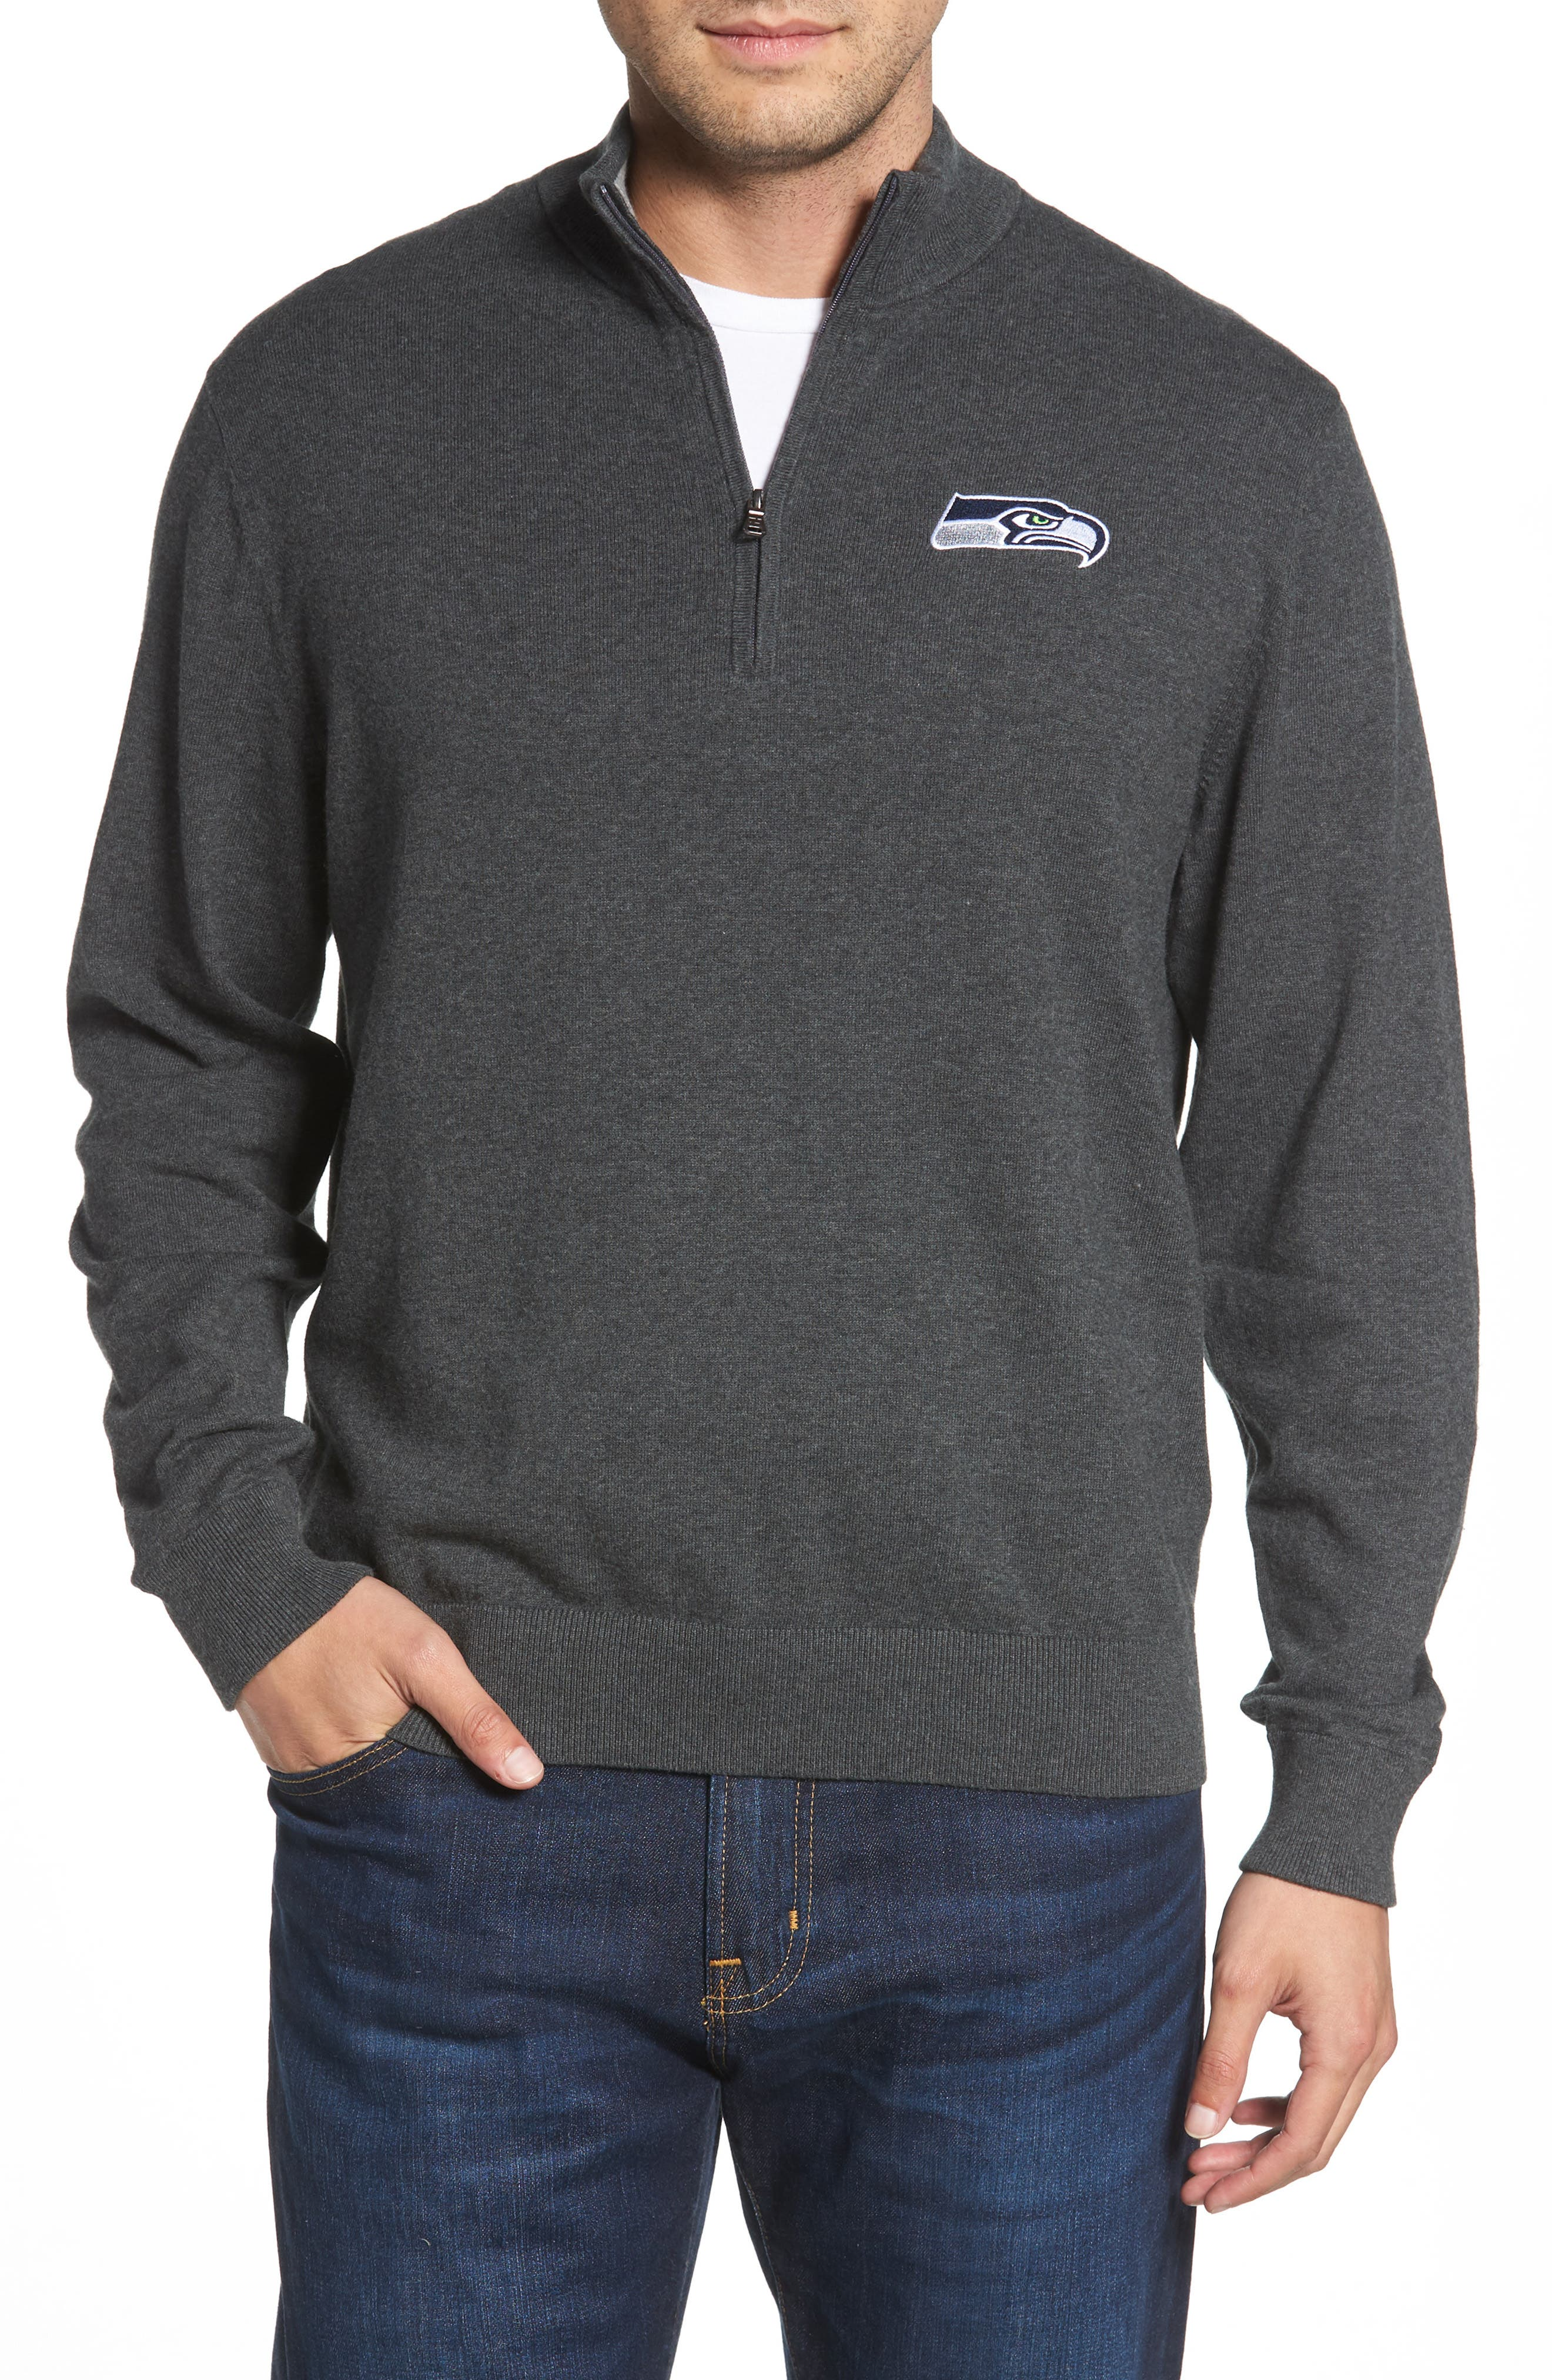 Seattle Seahawks - Lakemont Regular Fit Quarter Zip Sweater,                             Main thumbnail 1, color,                             CHARCOAL HEATHER